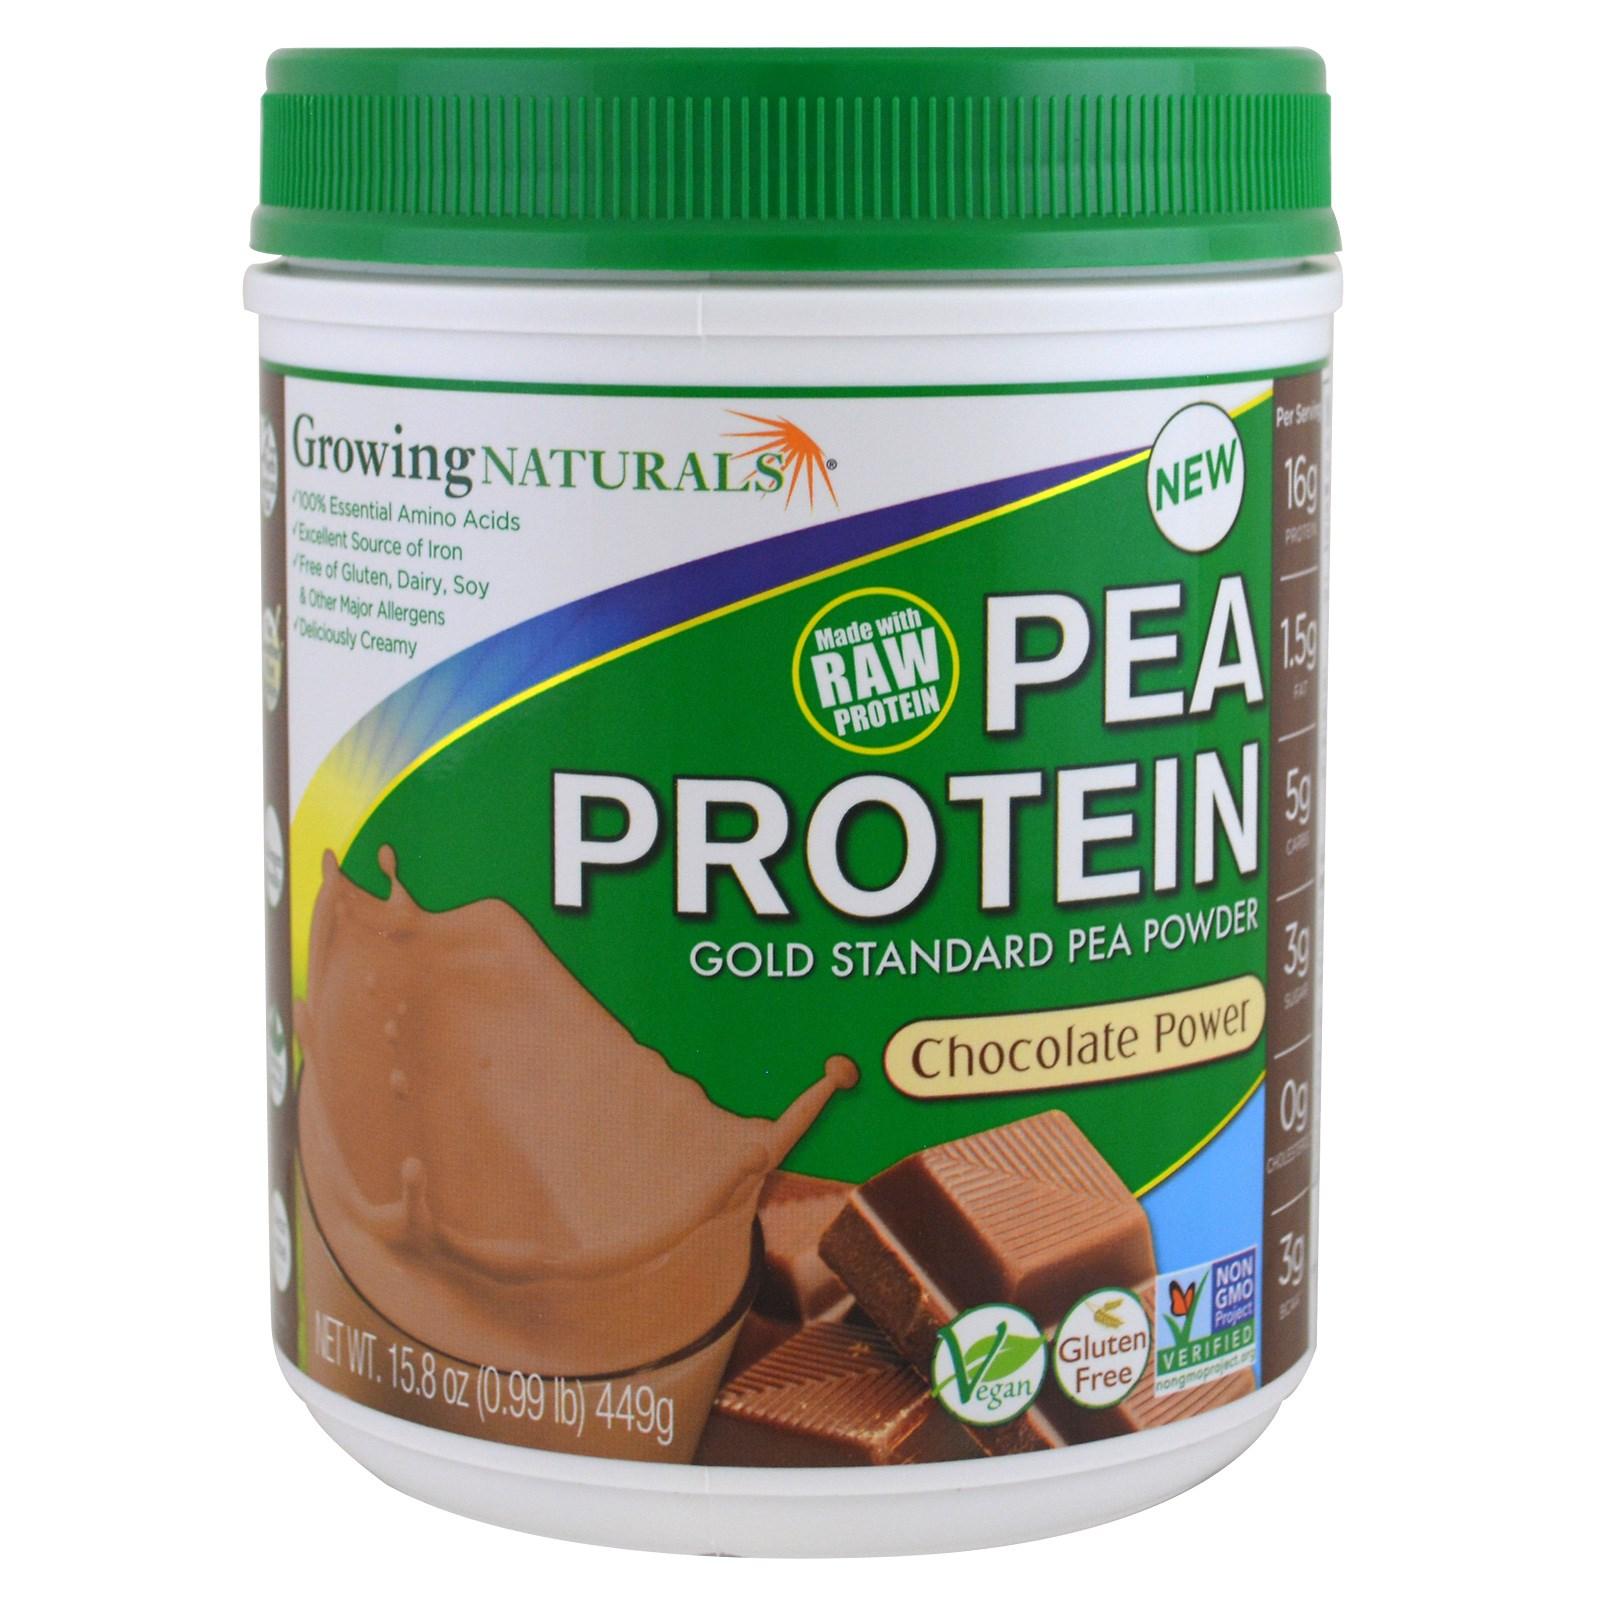 Growing Naturals ピープロテイン チョコレートパワー